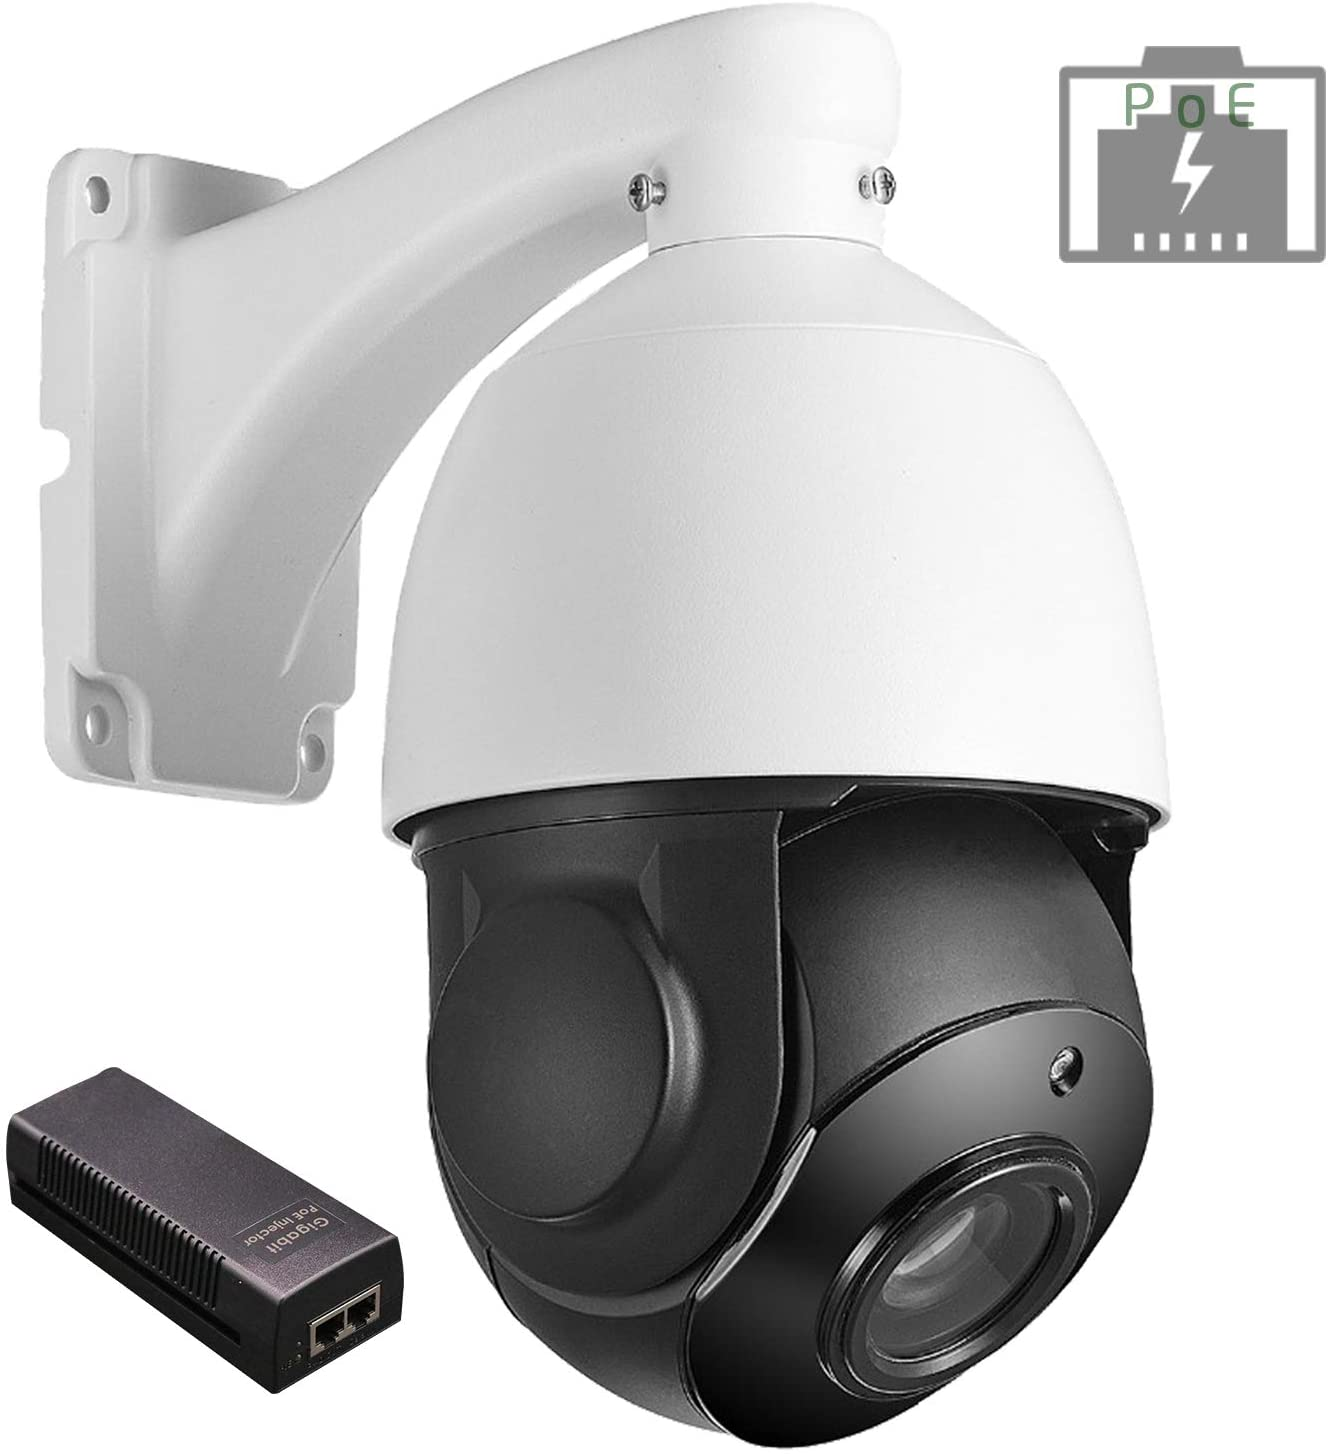 Nesuniq PTZ Camera Outdoor 5MP Ultra HD POE Security CCTV Dome Onvif IP Pan Tilt Zoom 18X Optical Lens Waterproof 2592x1944p 5megapixel Surveillance Webcam 262ft IR Night Vision Card Slot POE Injector